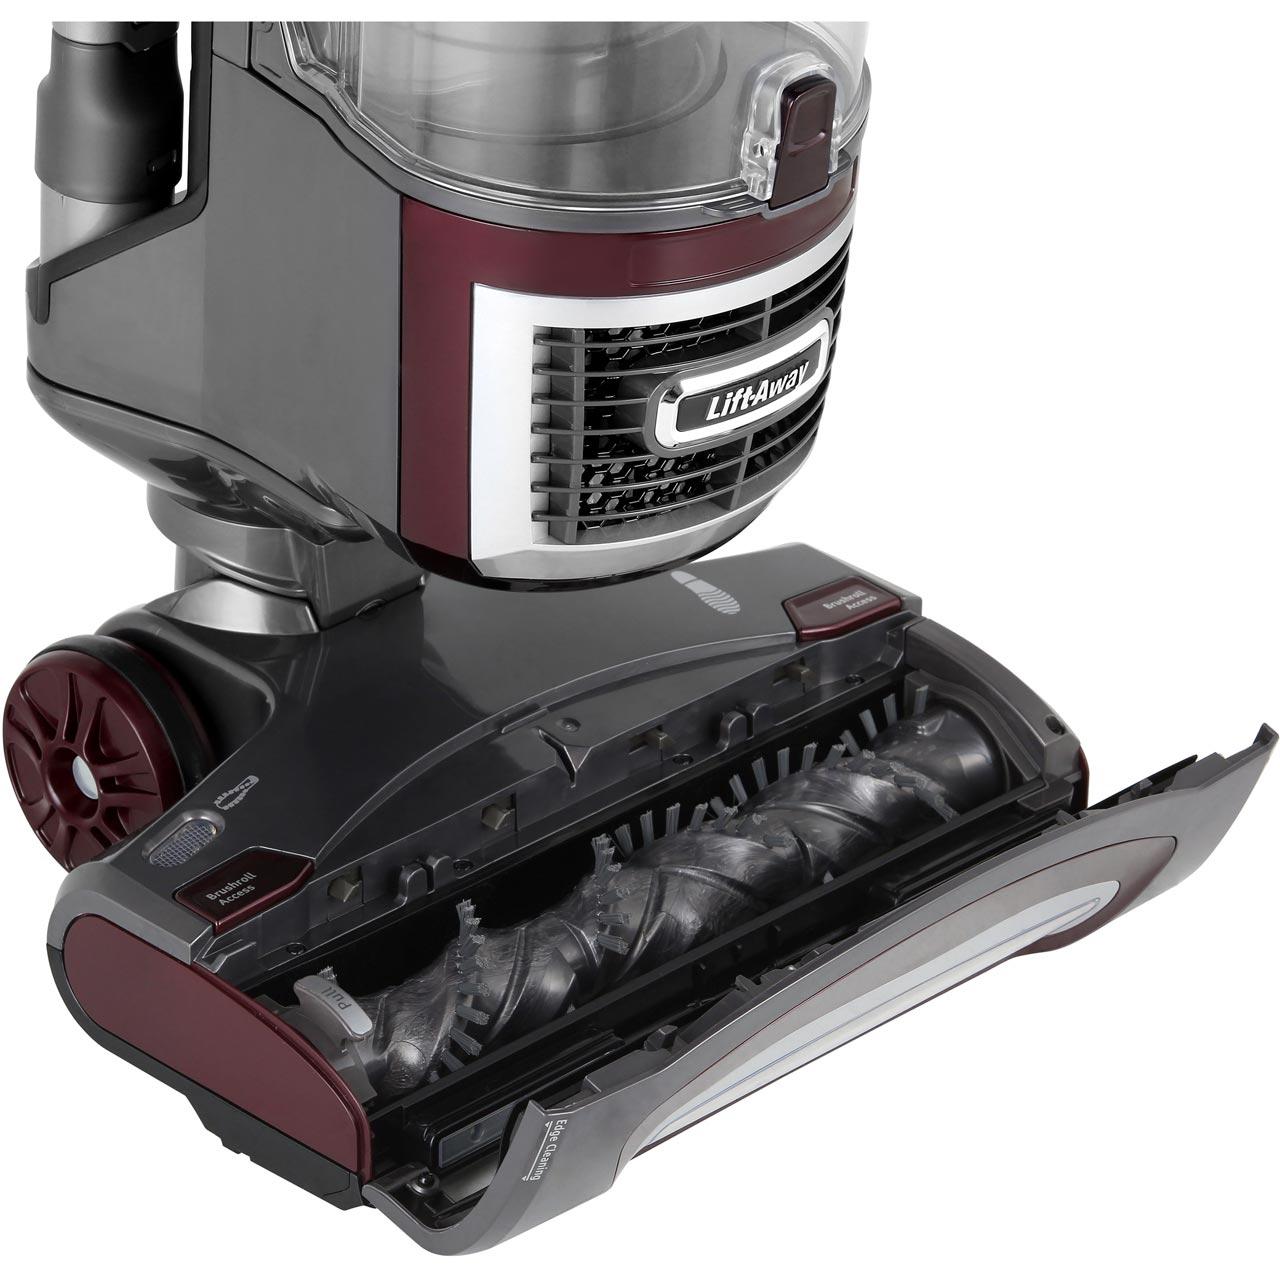 Shark Nv601ukt Lift Away True Pet Upright Vacuum Cleaner